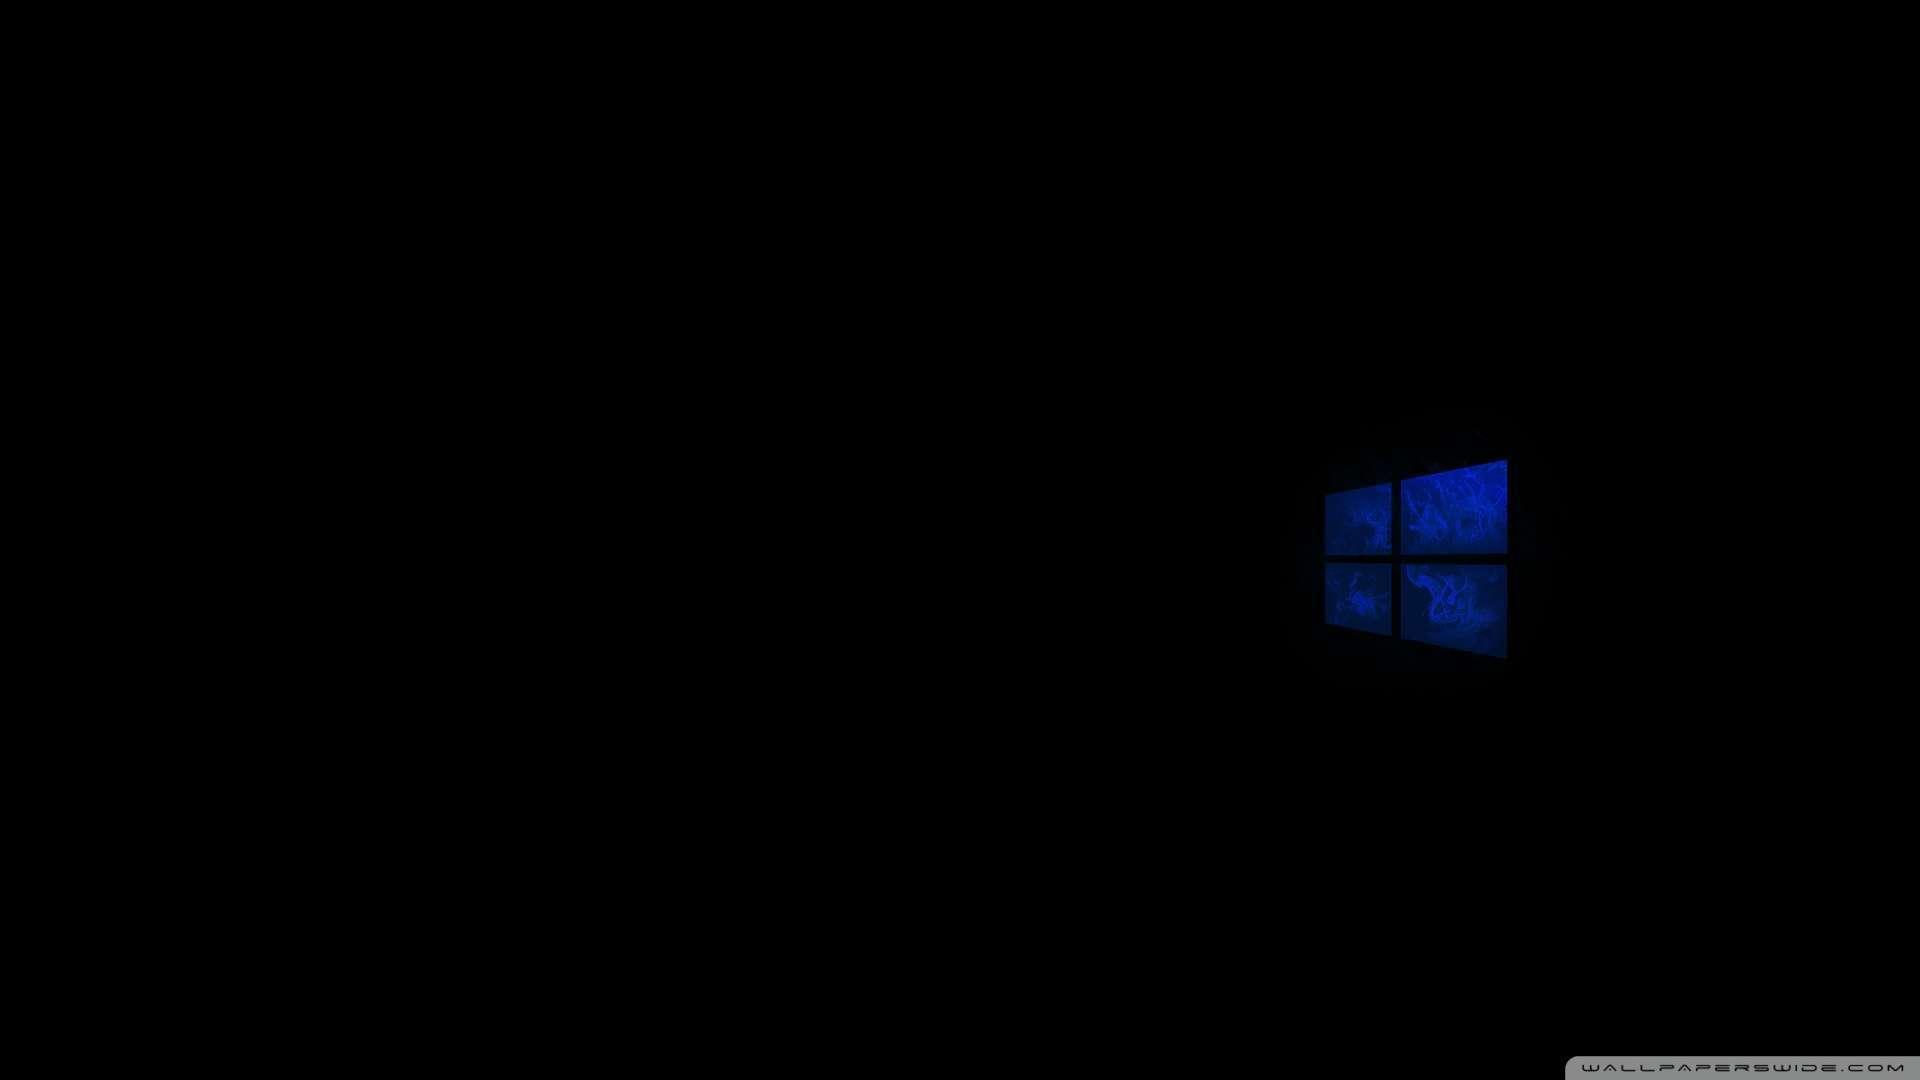 Black Windows Wallpaper 1080p: [48+] Windows 10 HD Dark Wallpaper On WallpaperSafari